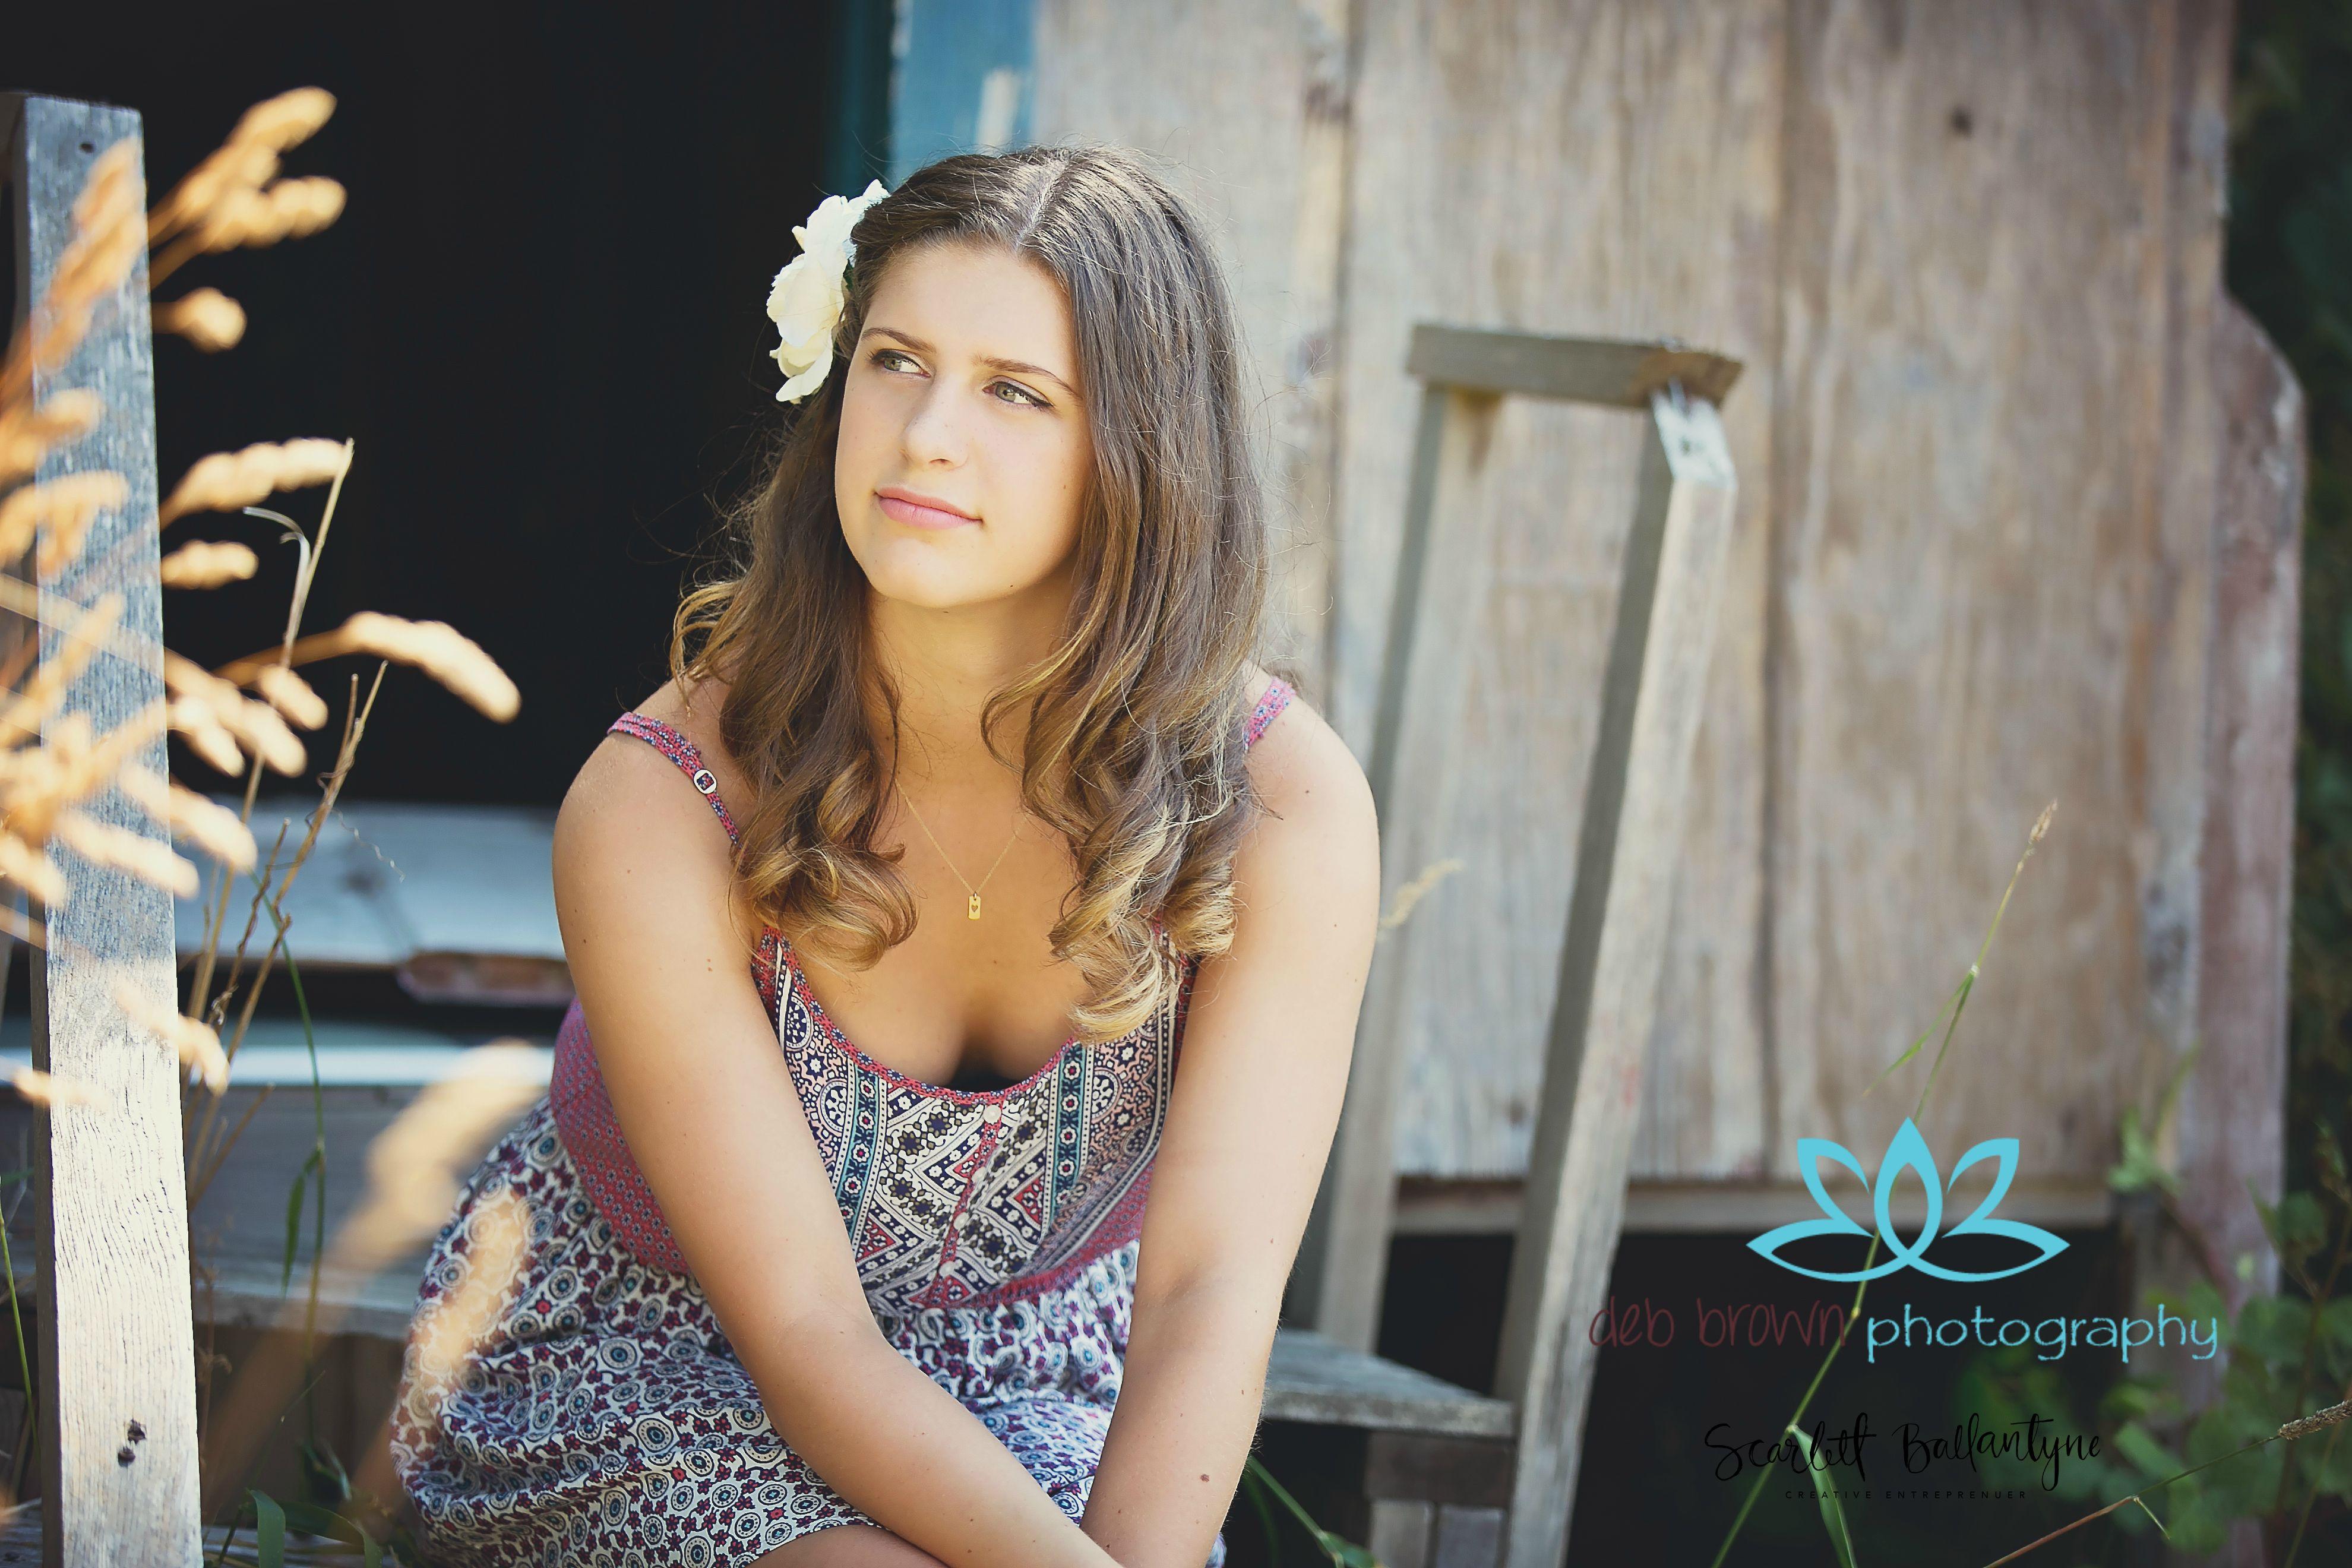 52 best images about Celesbians on Pinterest | Nancy dell